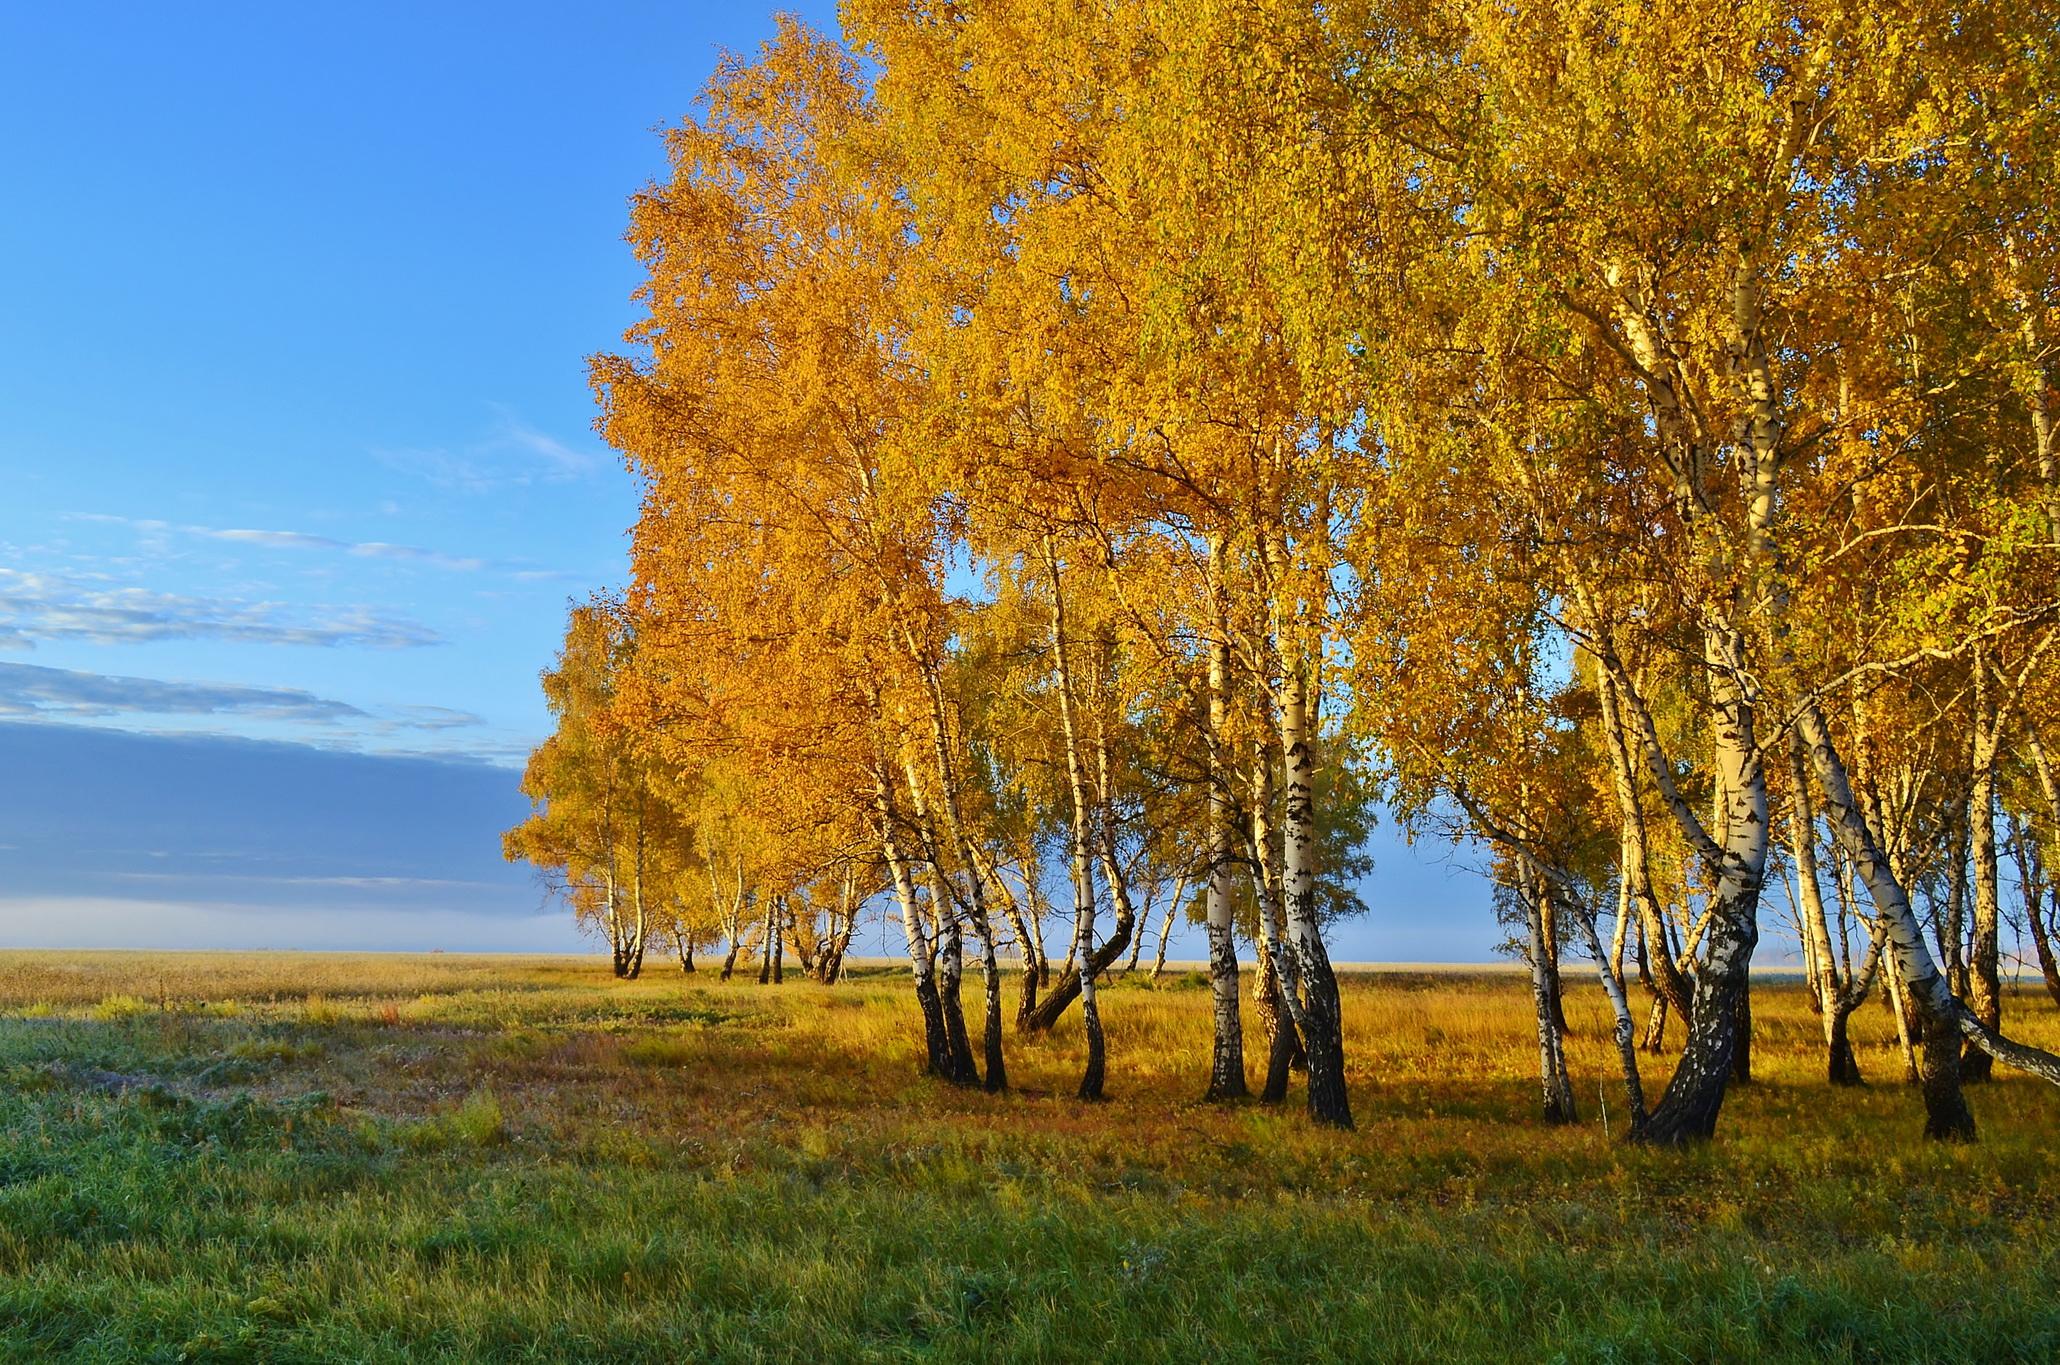 картинки березы осенью